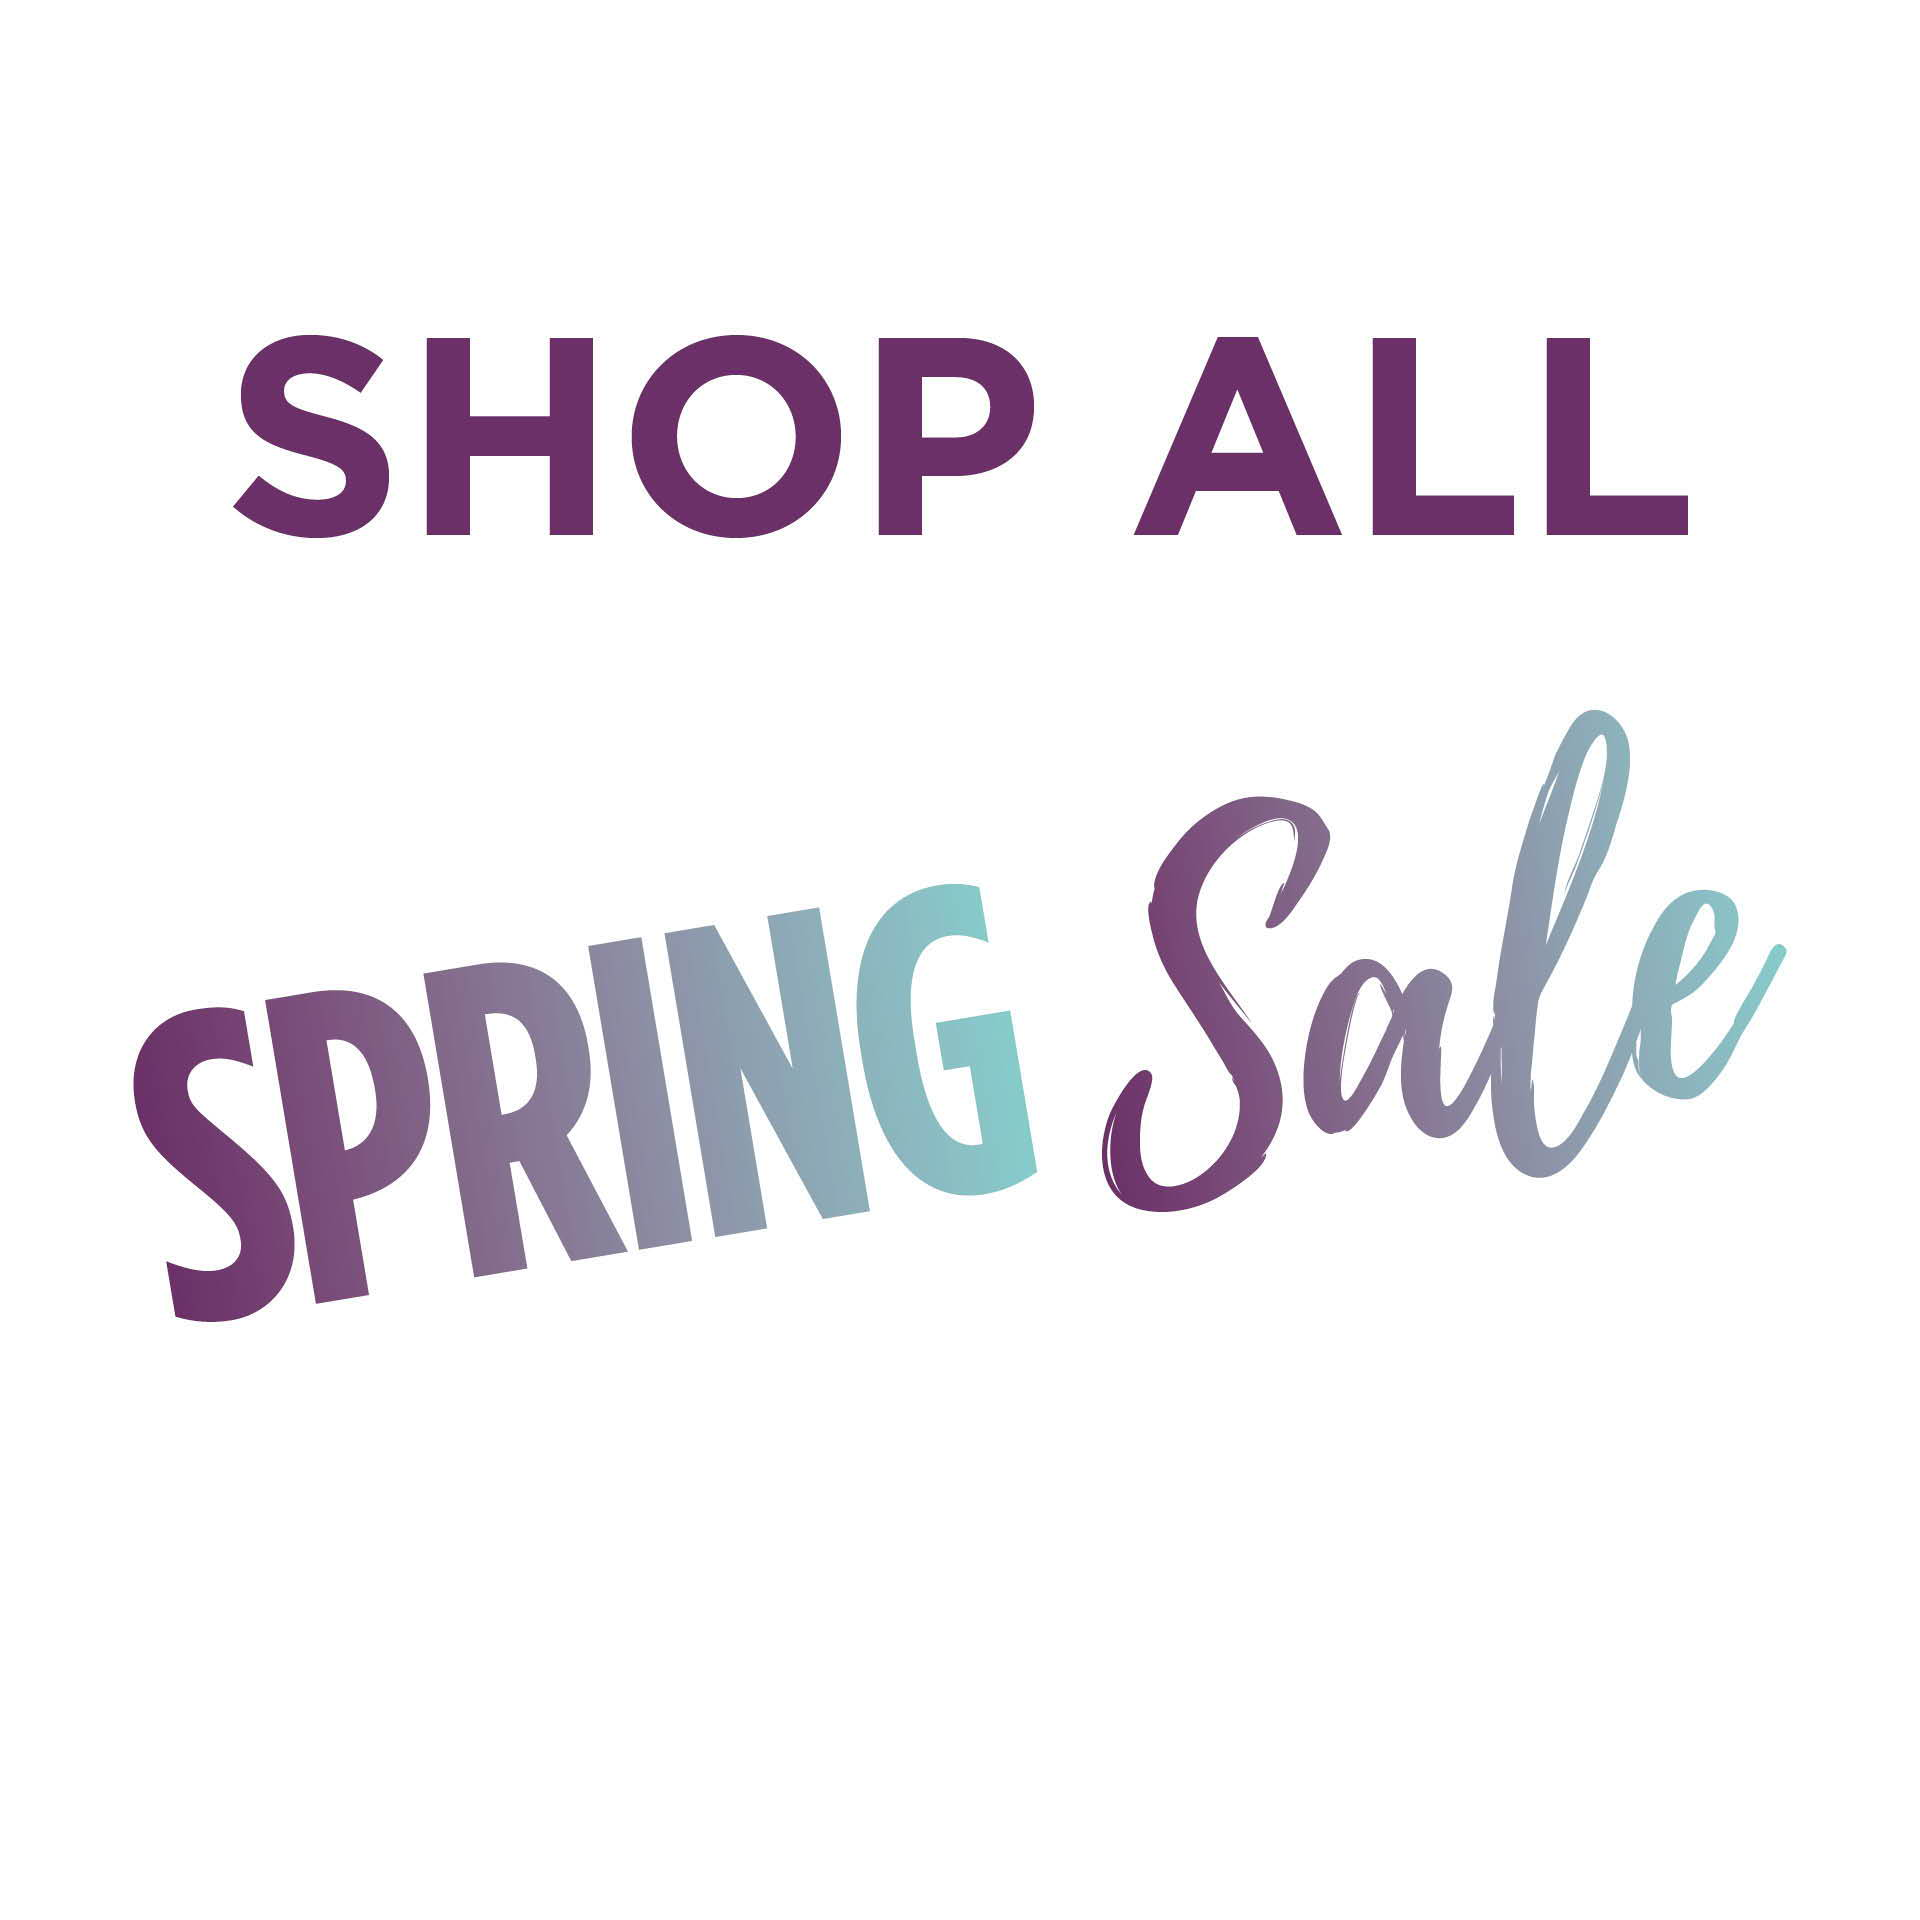 Shop all spring sale